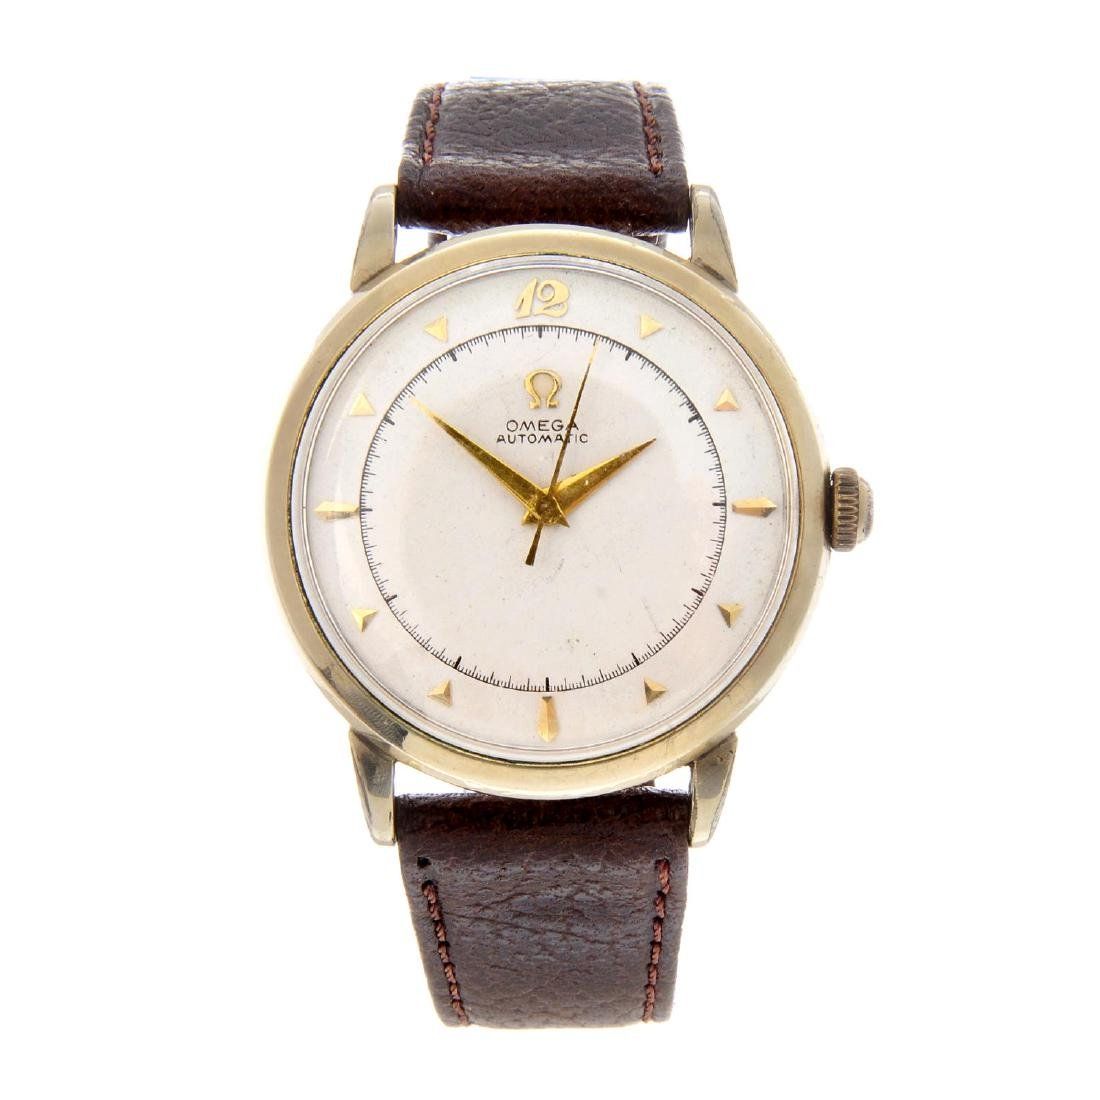 OMEGA - a gentleman's wrist watch. Gold filled case.